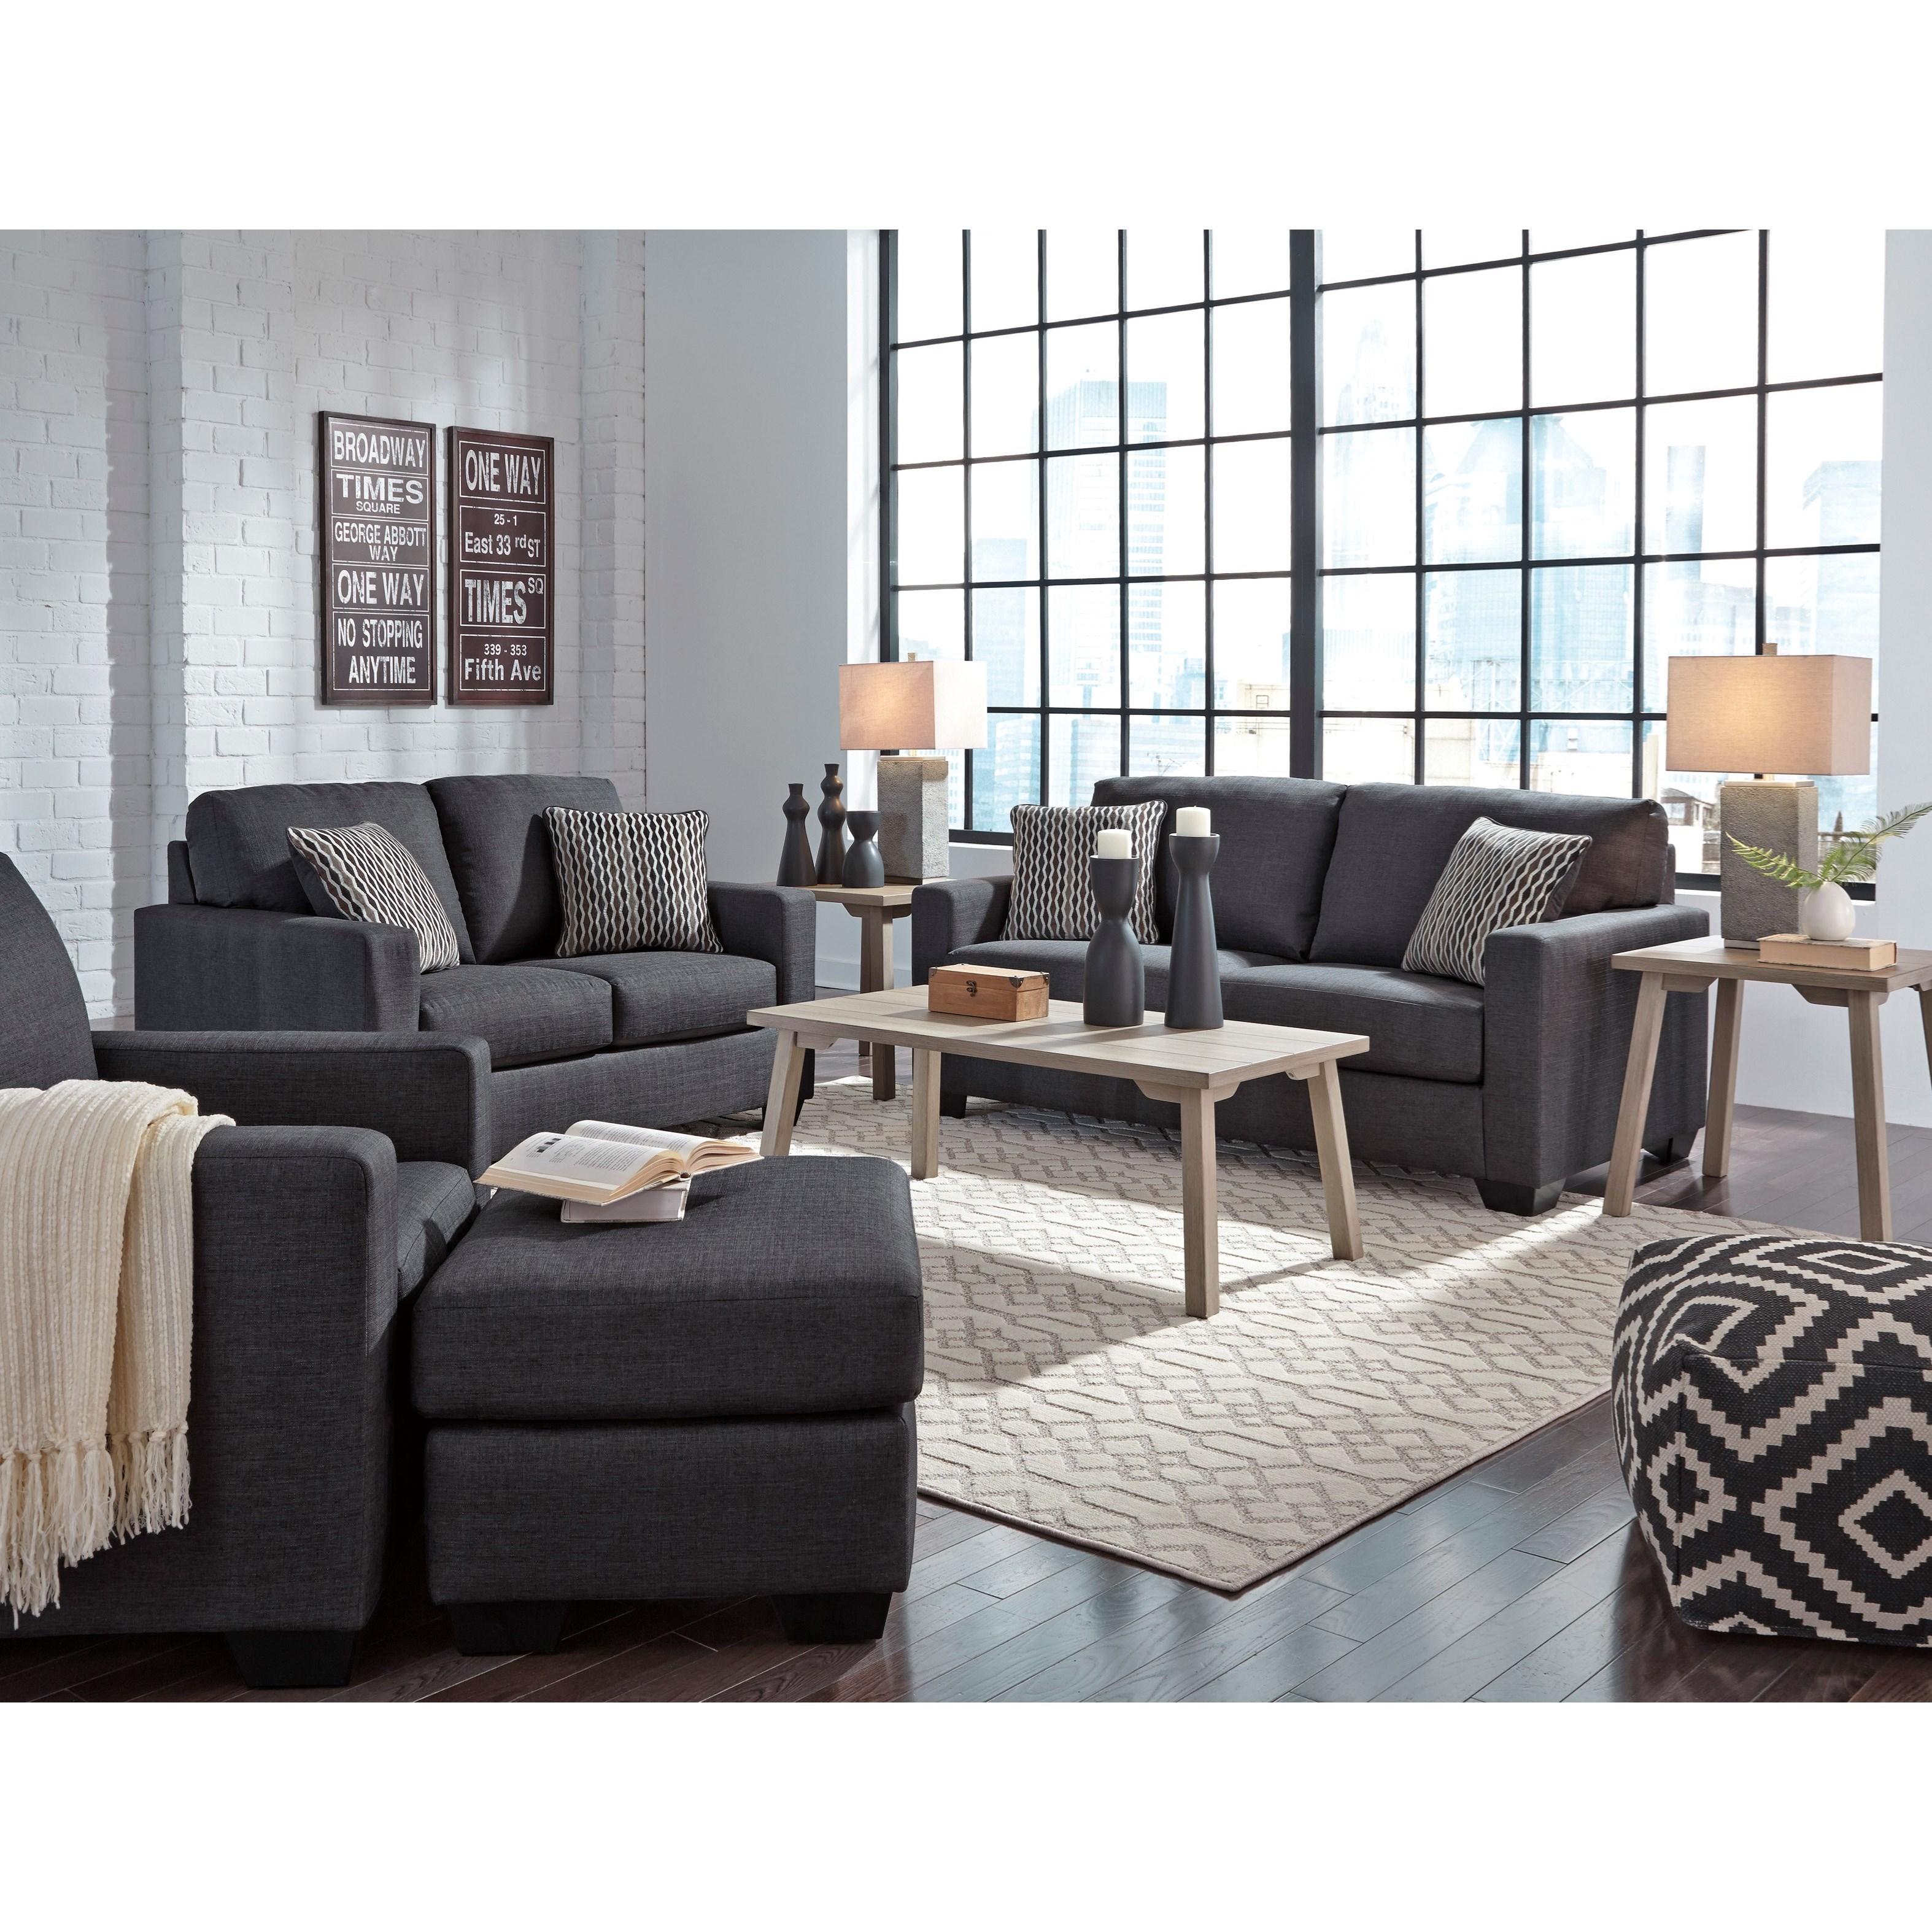 Benchcraft Bavello Contemporary Full Sofa Sleeper With